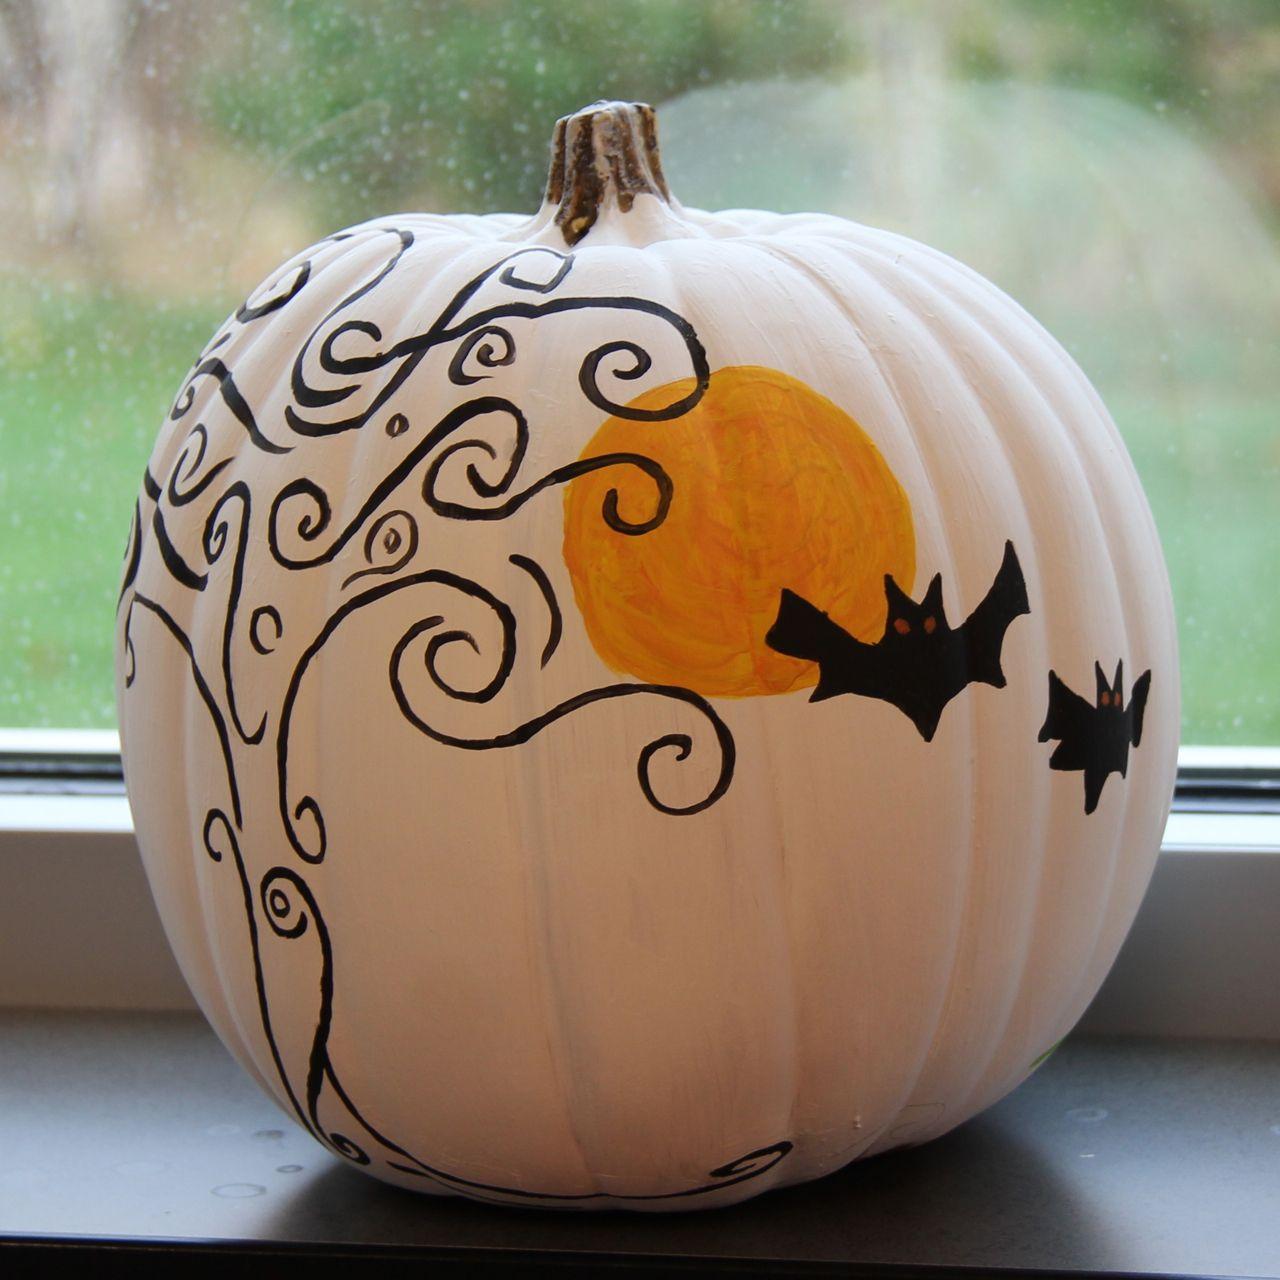 2013 Staff Pumpkin Decorating Contest  #pumpkin #halloween #contest #pediatricdentist #paintedpumpkinideas